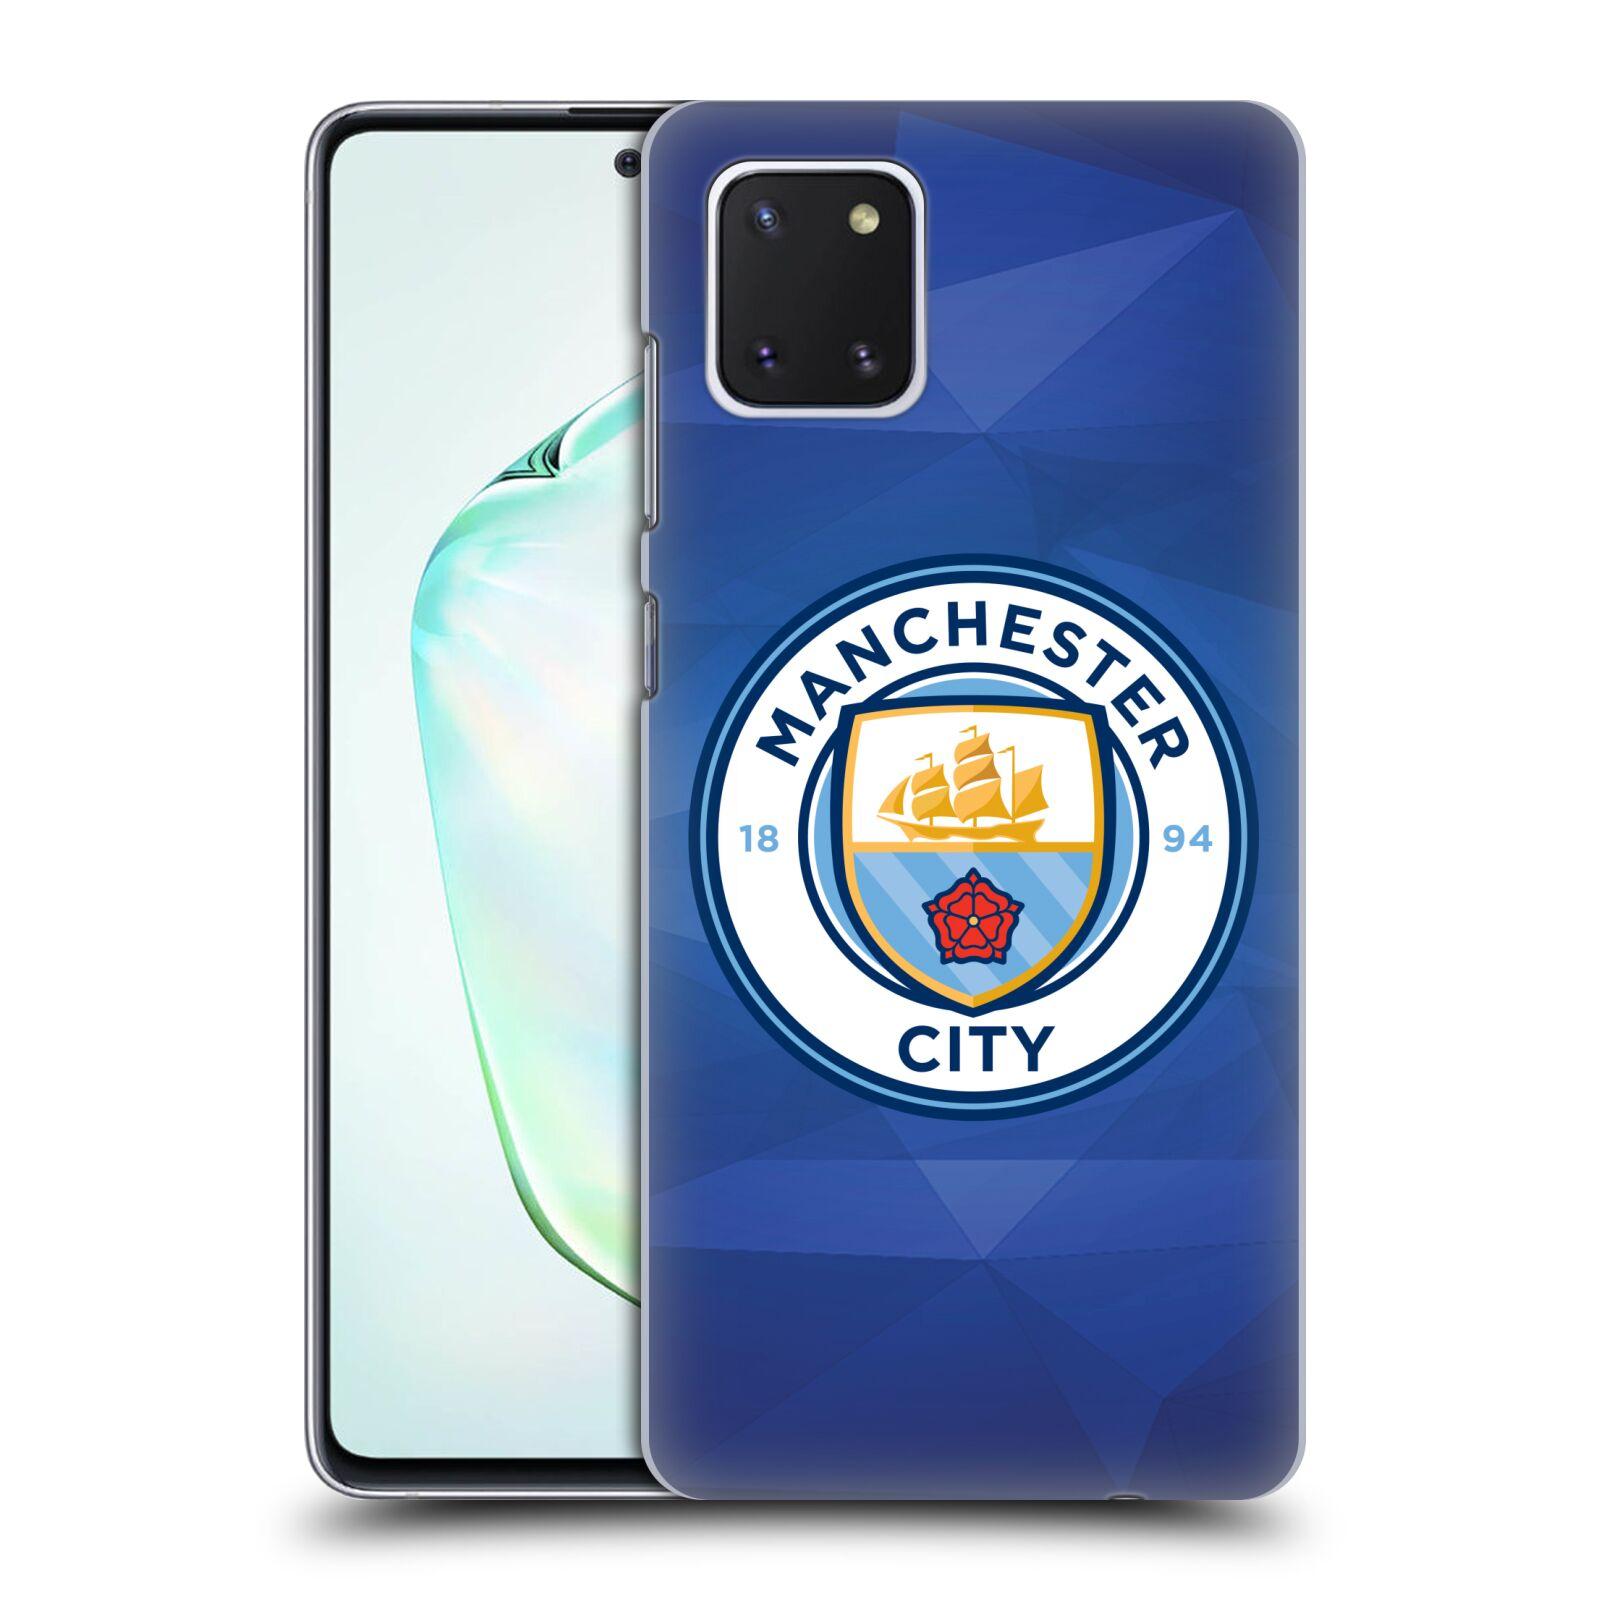 Plastové pouzdro na mobil Samsung Galaxy Note 10 Lite - Head Case - Manchester City FC - Modré nové logo